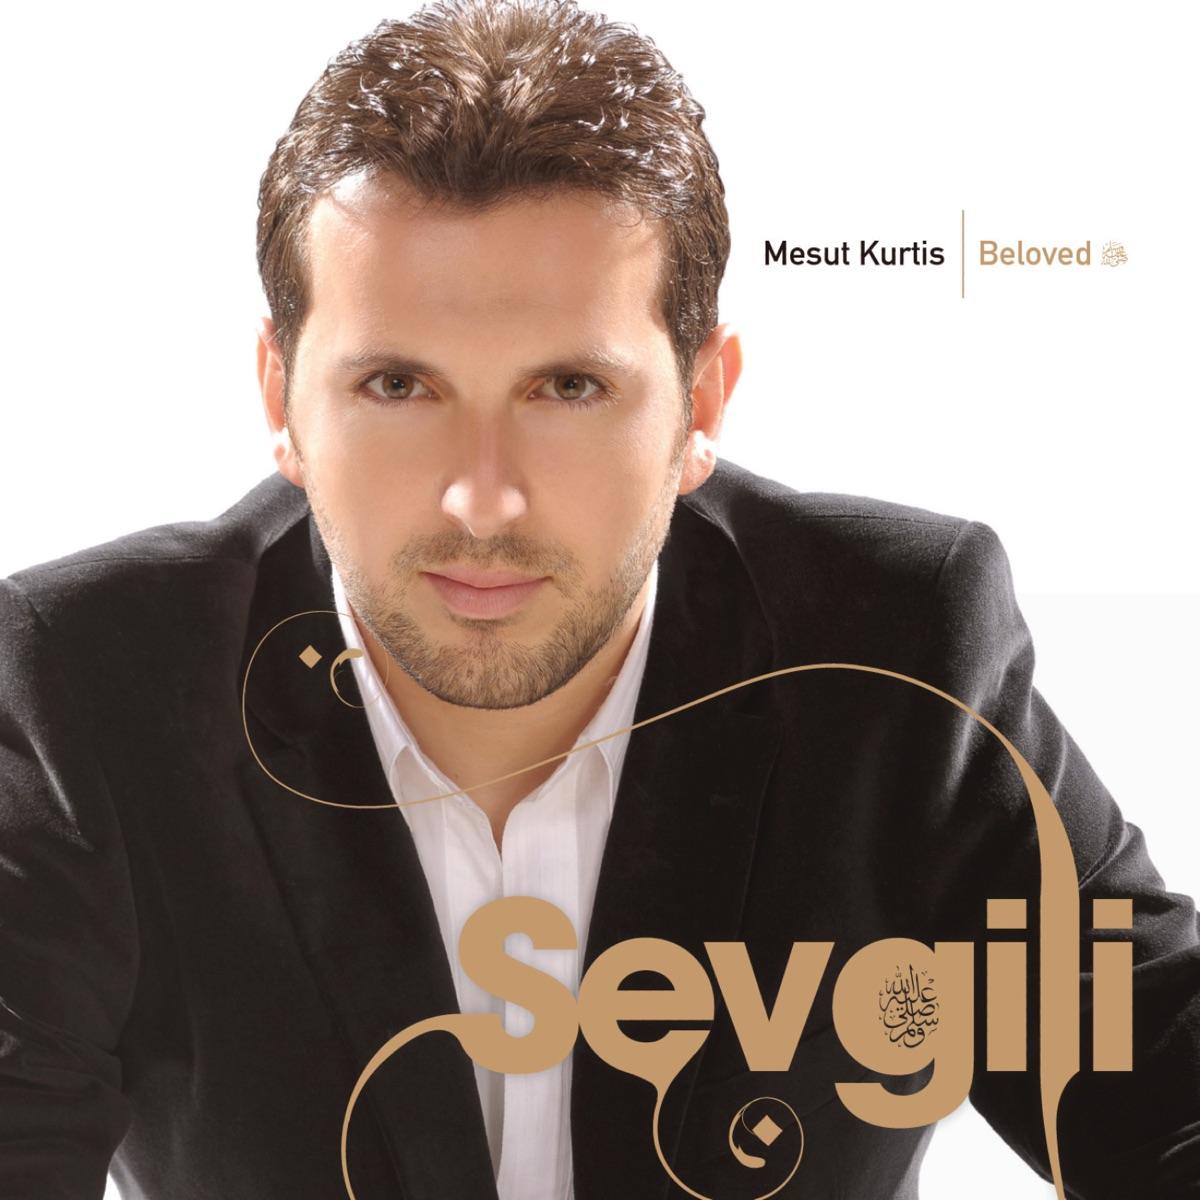 Sevgili Album Cover by Mesut Kurtis